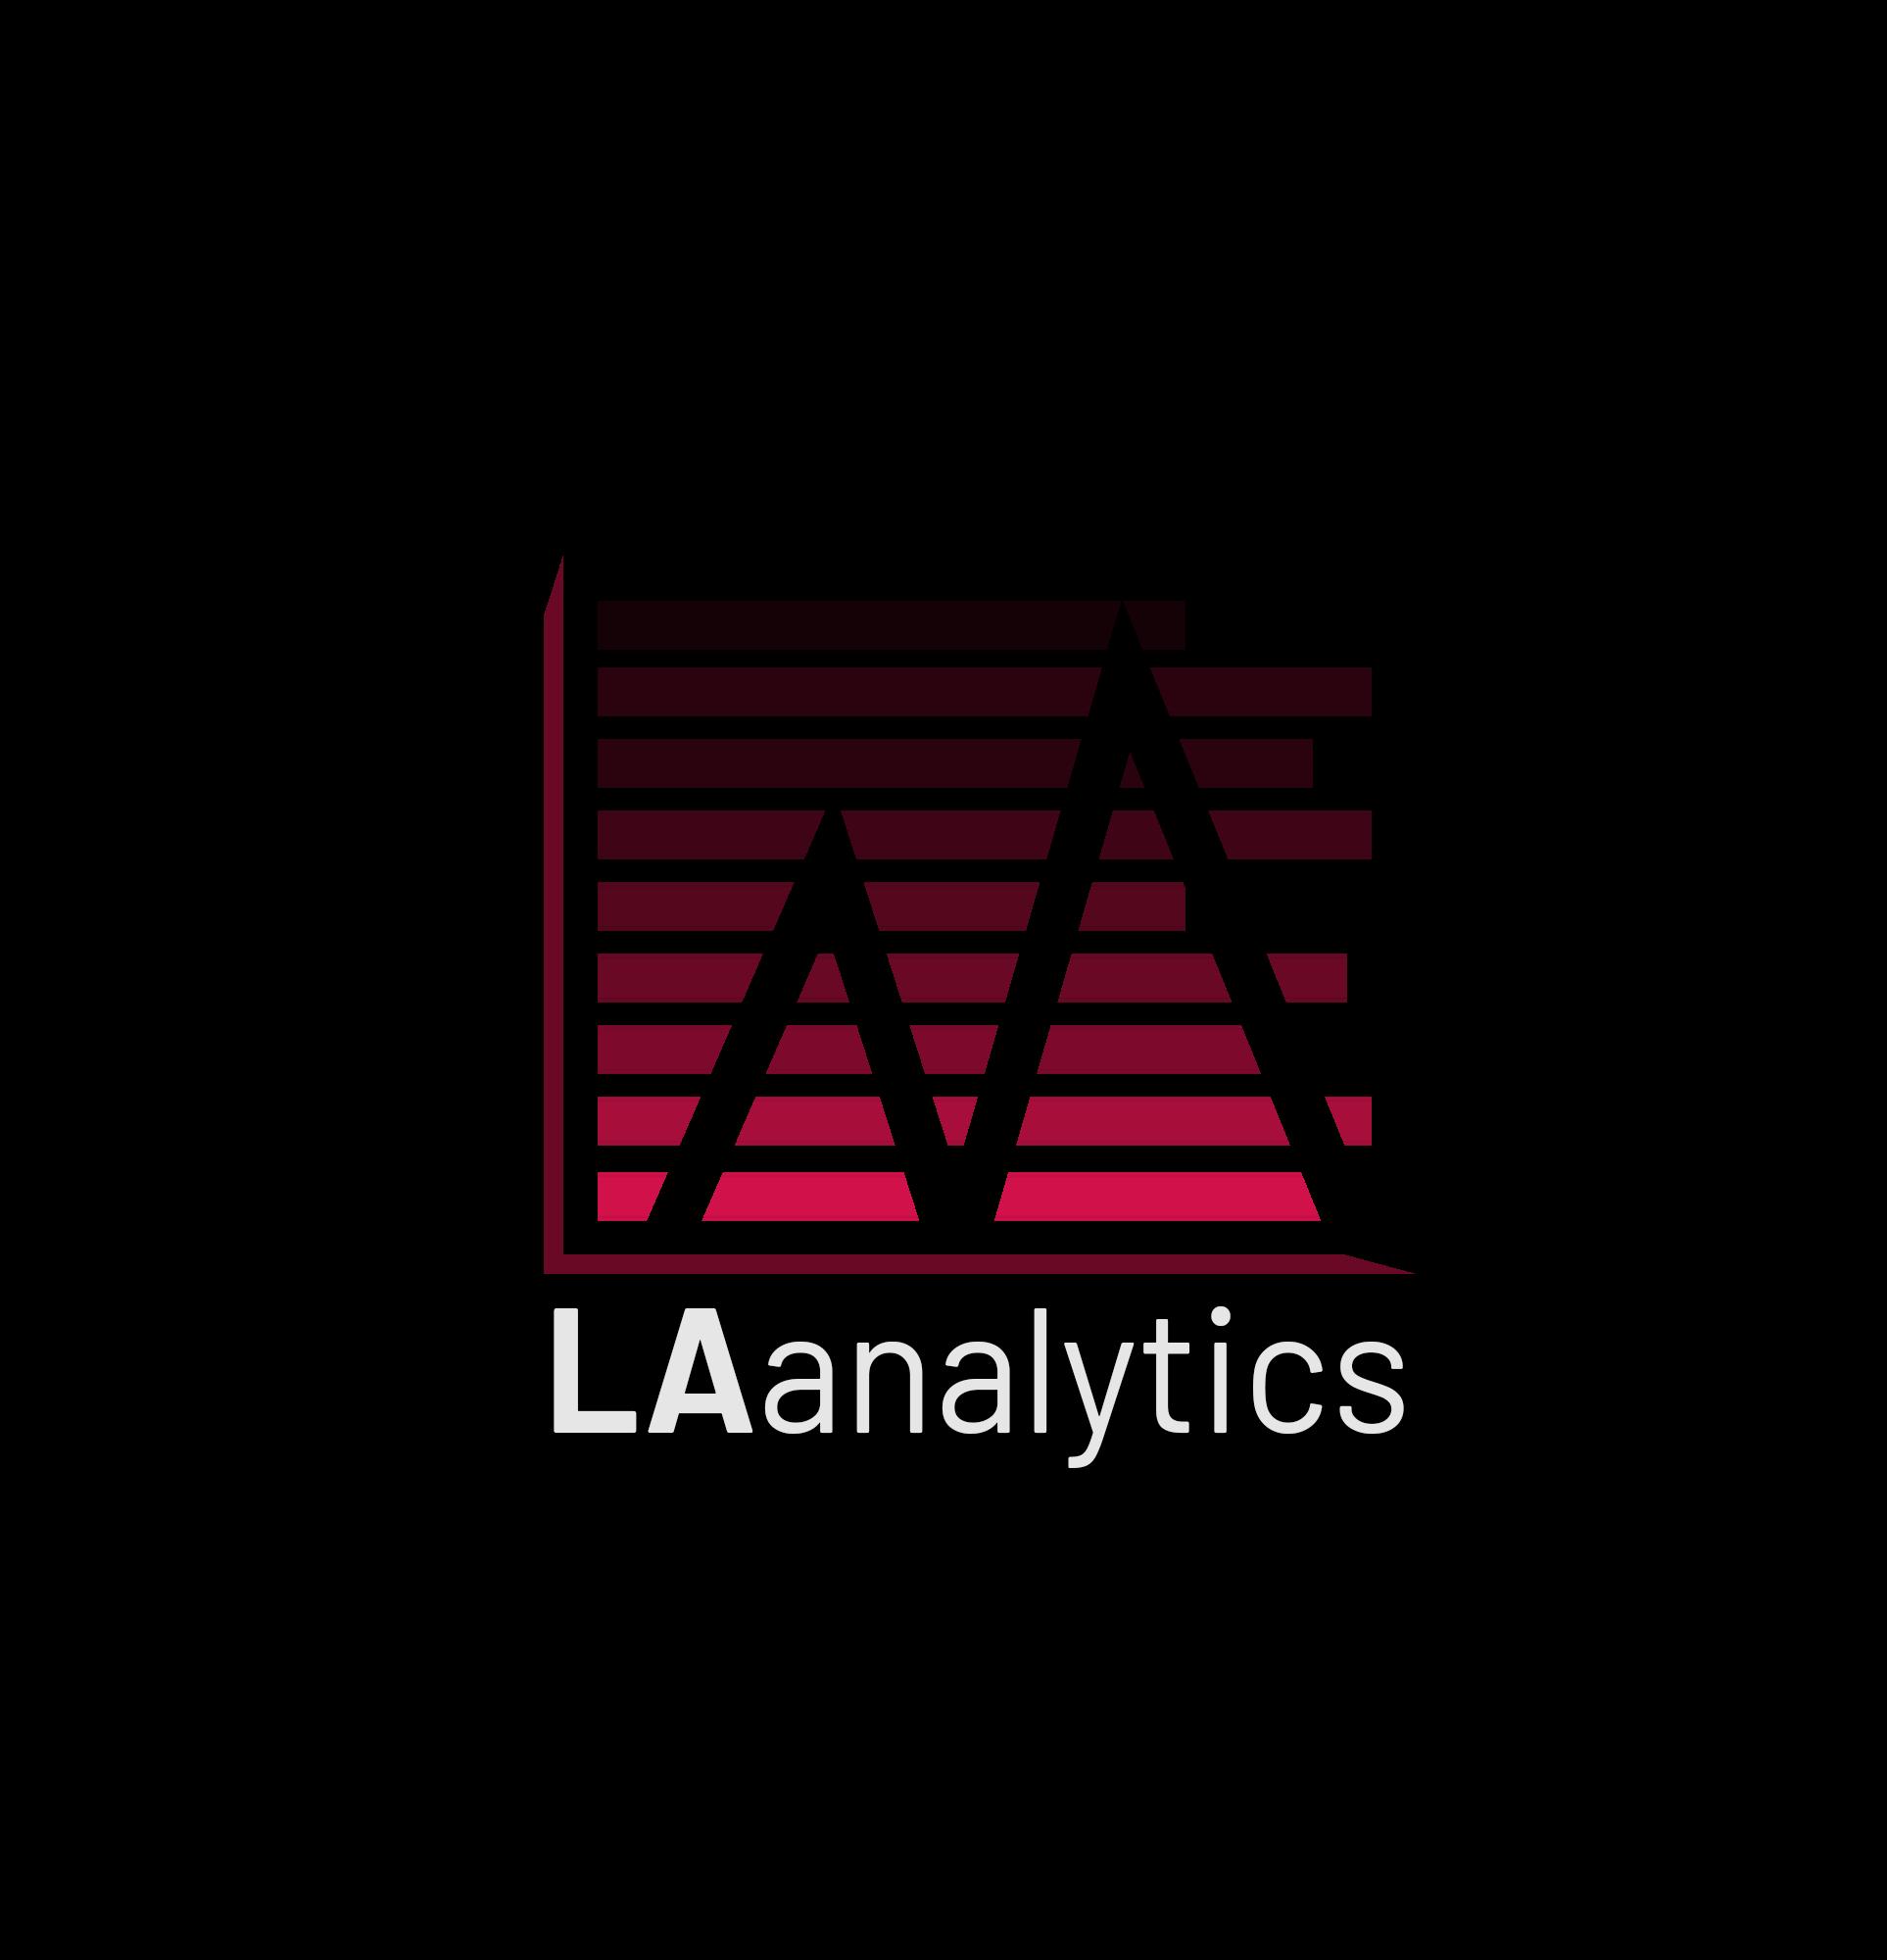 An alternative logo design for LA Analytics